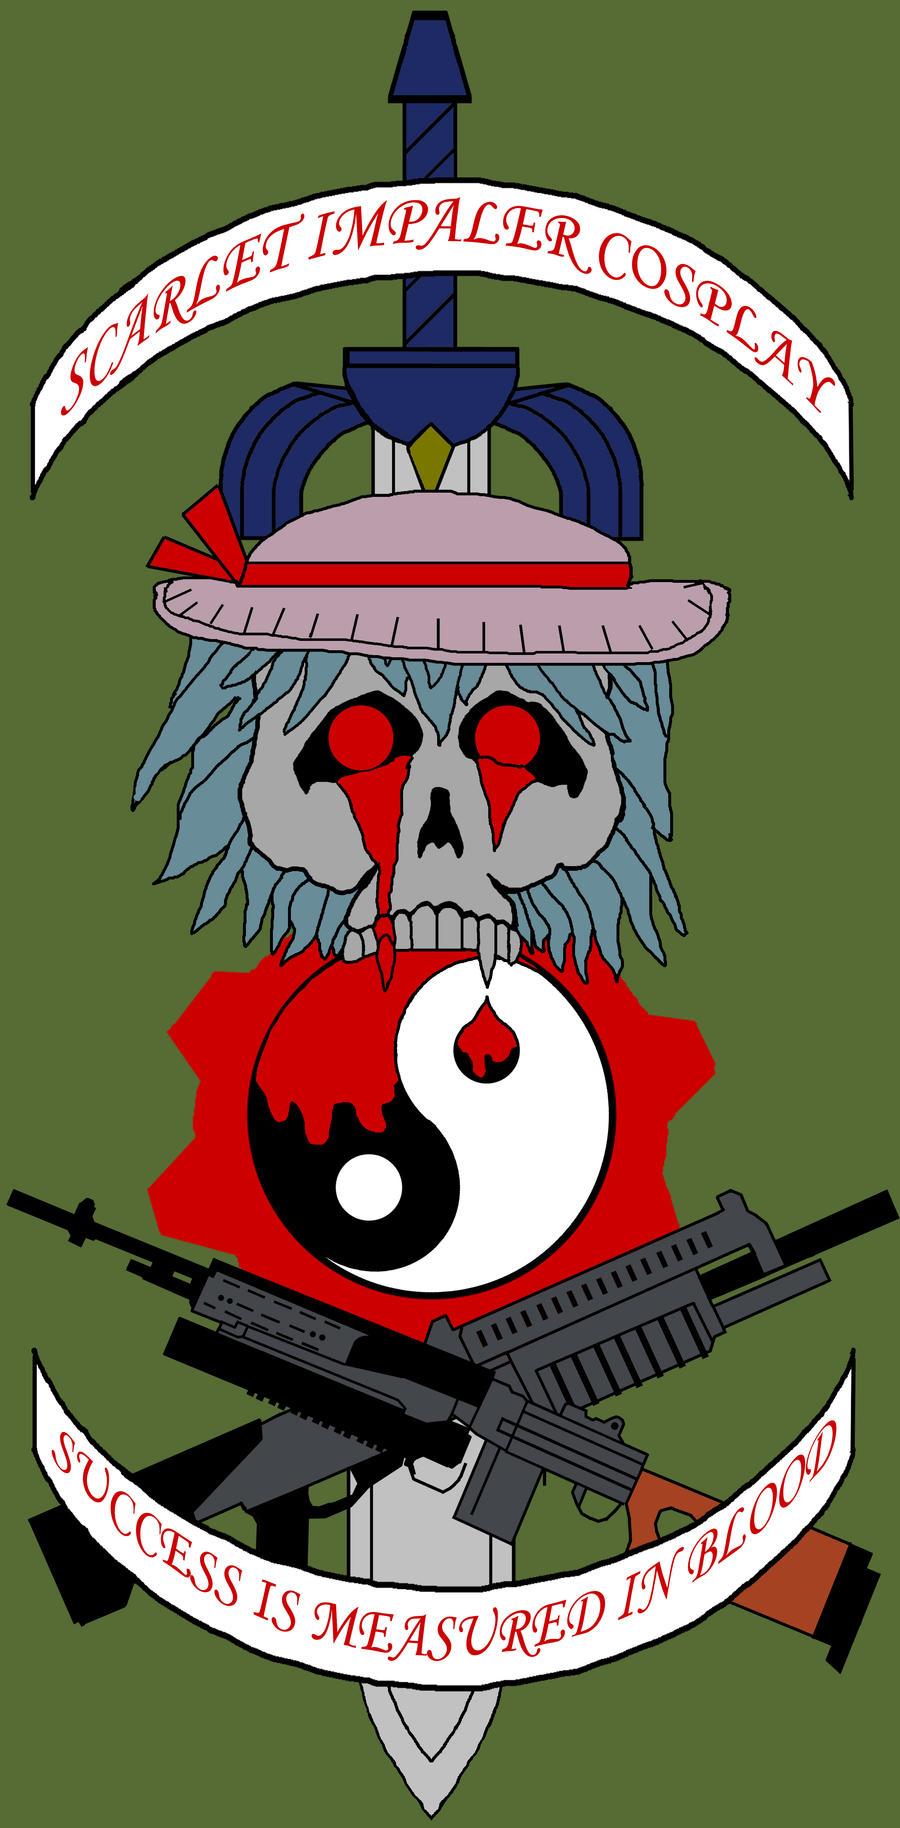 Scarlet-Impaler's Profile Picture